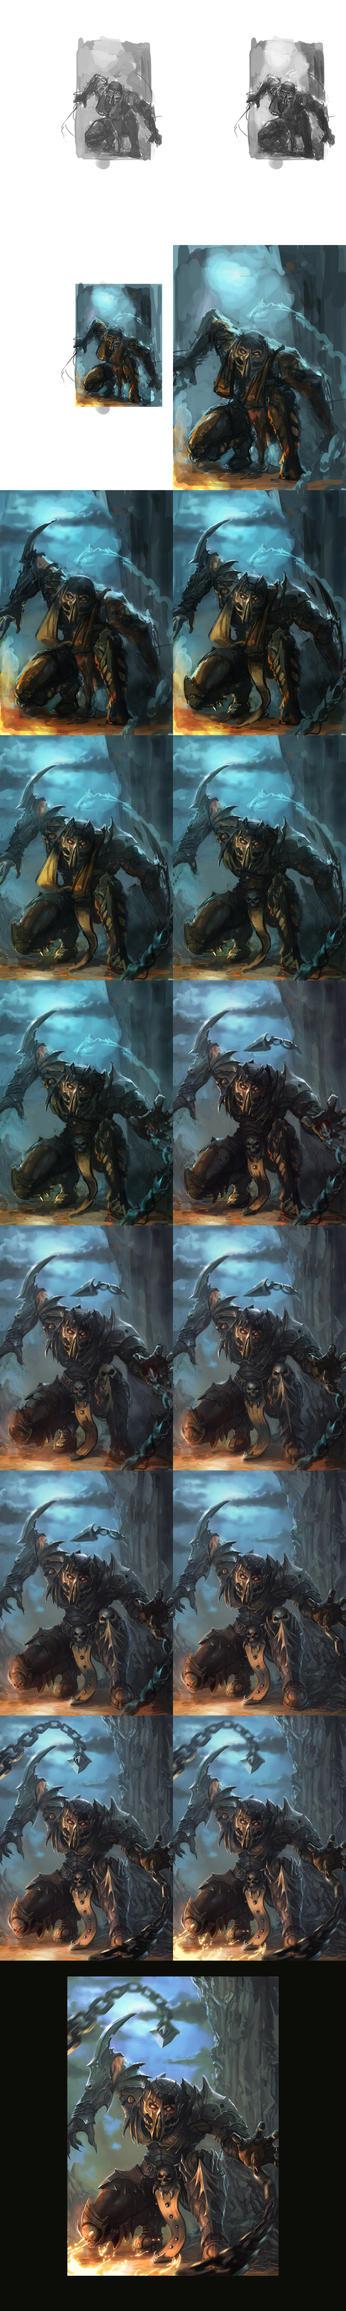 Scorpion-steps by Peter-Ortiz